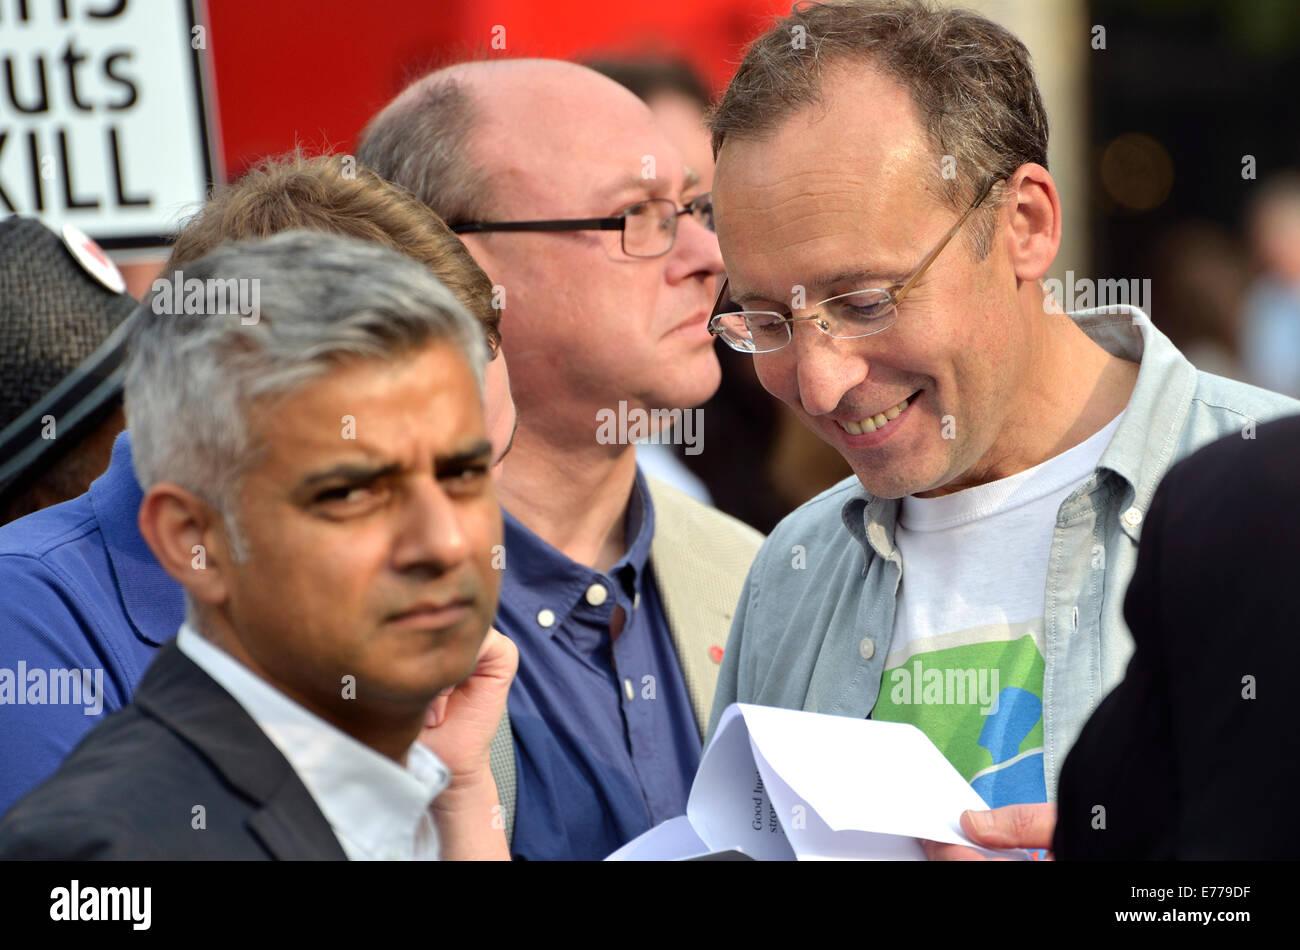 Andy Slaughter MP (Labour, Hammersmith) with Sadiq Khan (Labour, Tooting) and Grahame Morris MP (Labour, Easington) - Stock Image